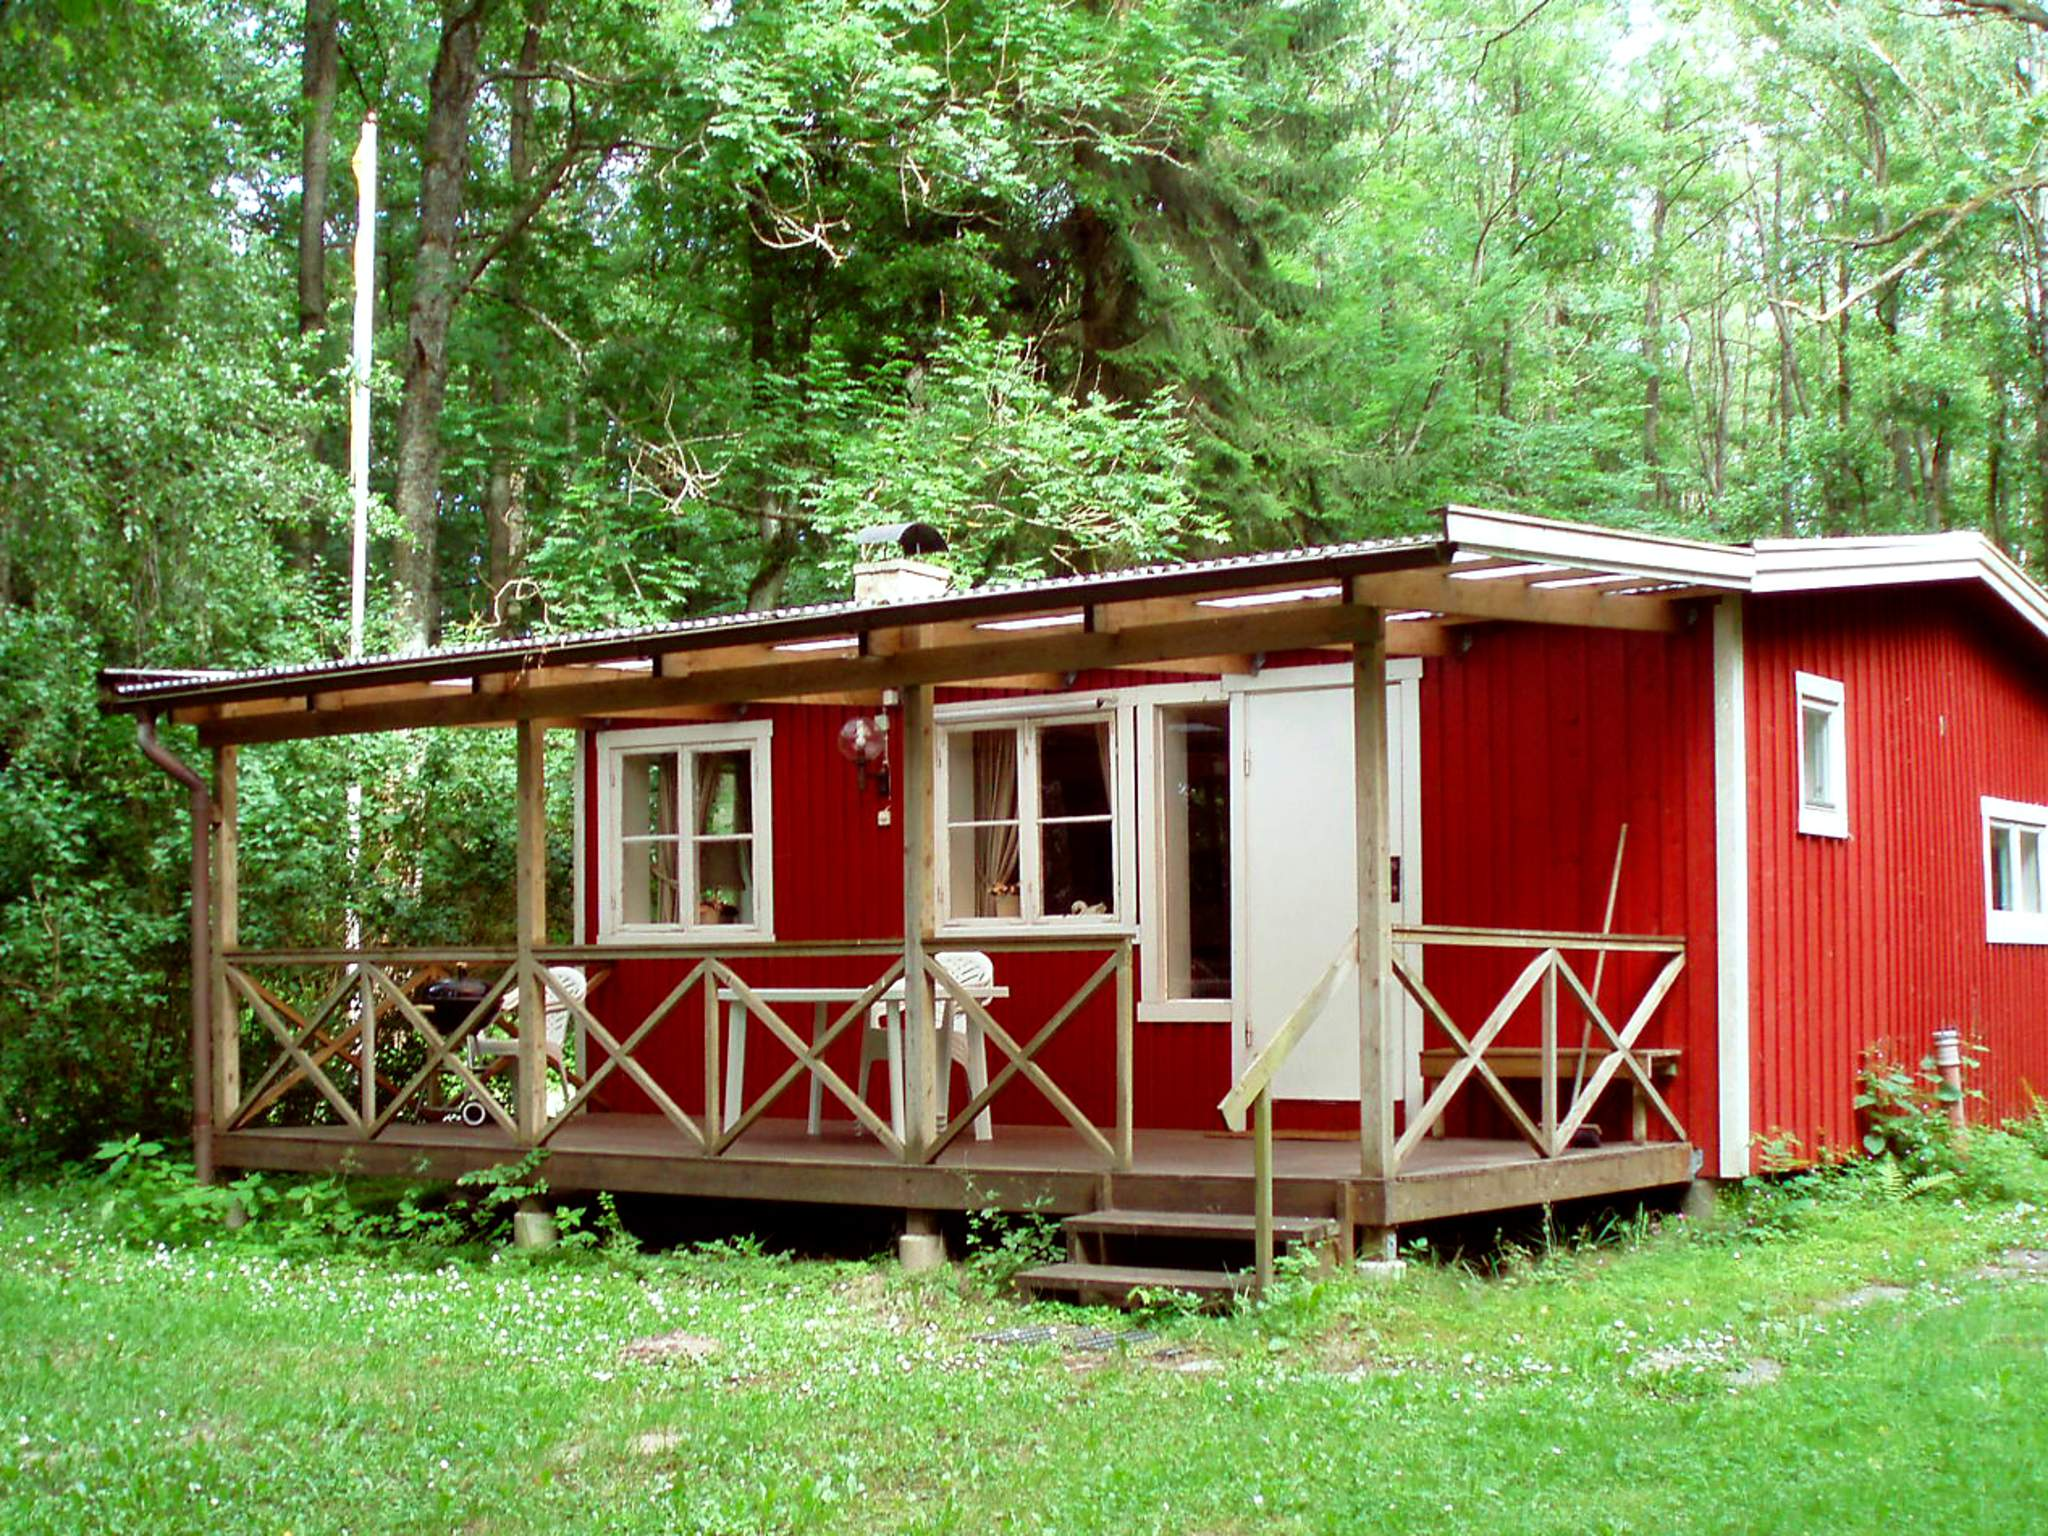 Ferienhaus Melldala (82042), Lerdala, Västra Götaland län, Westschweden, Schweden, Bild 2